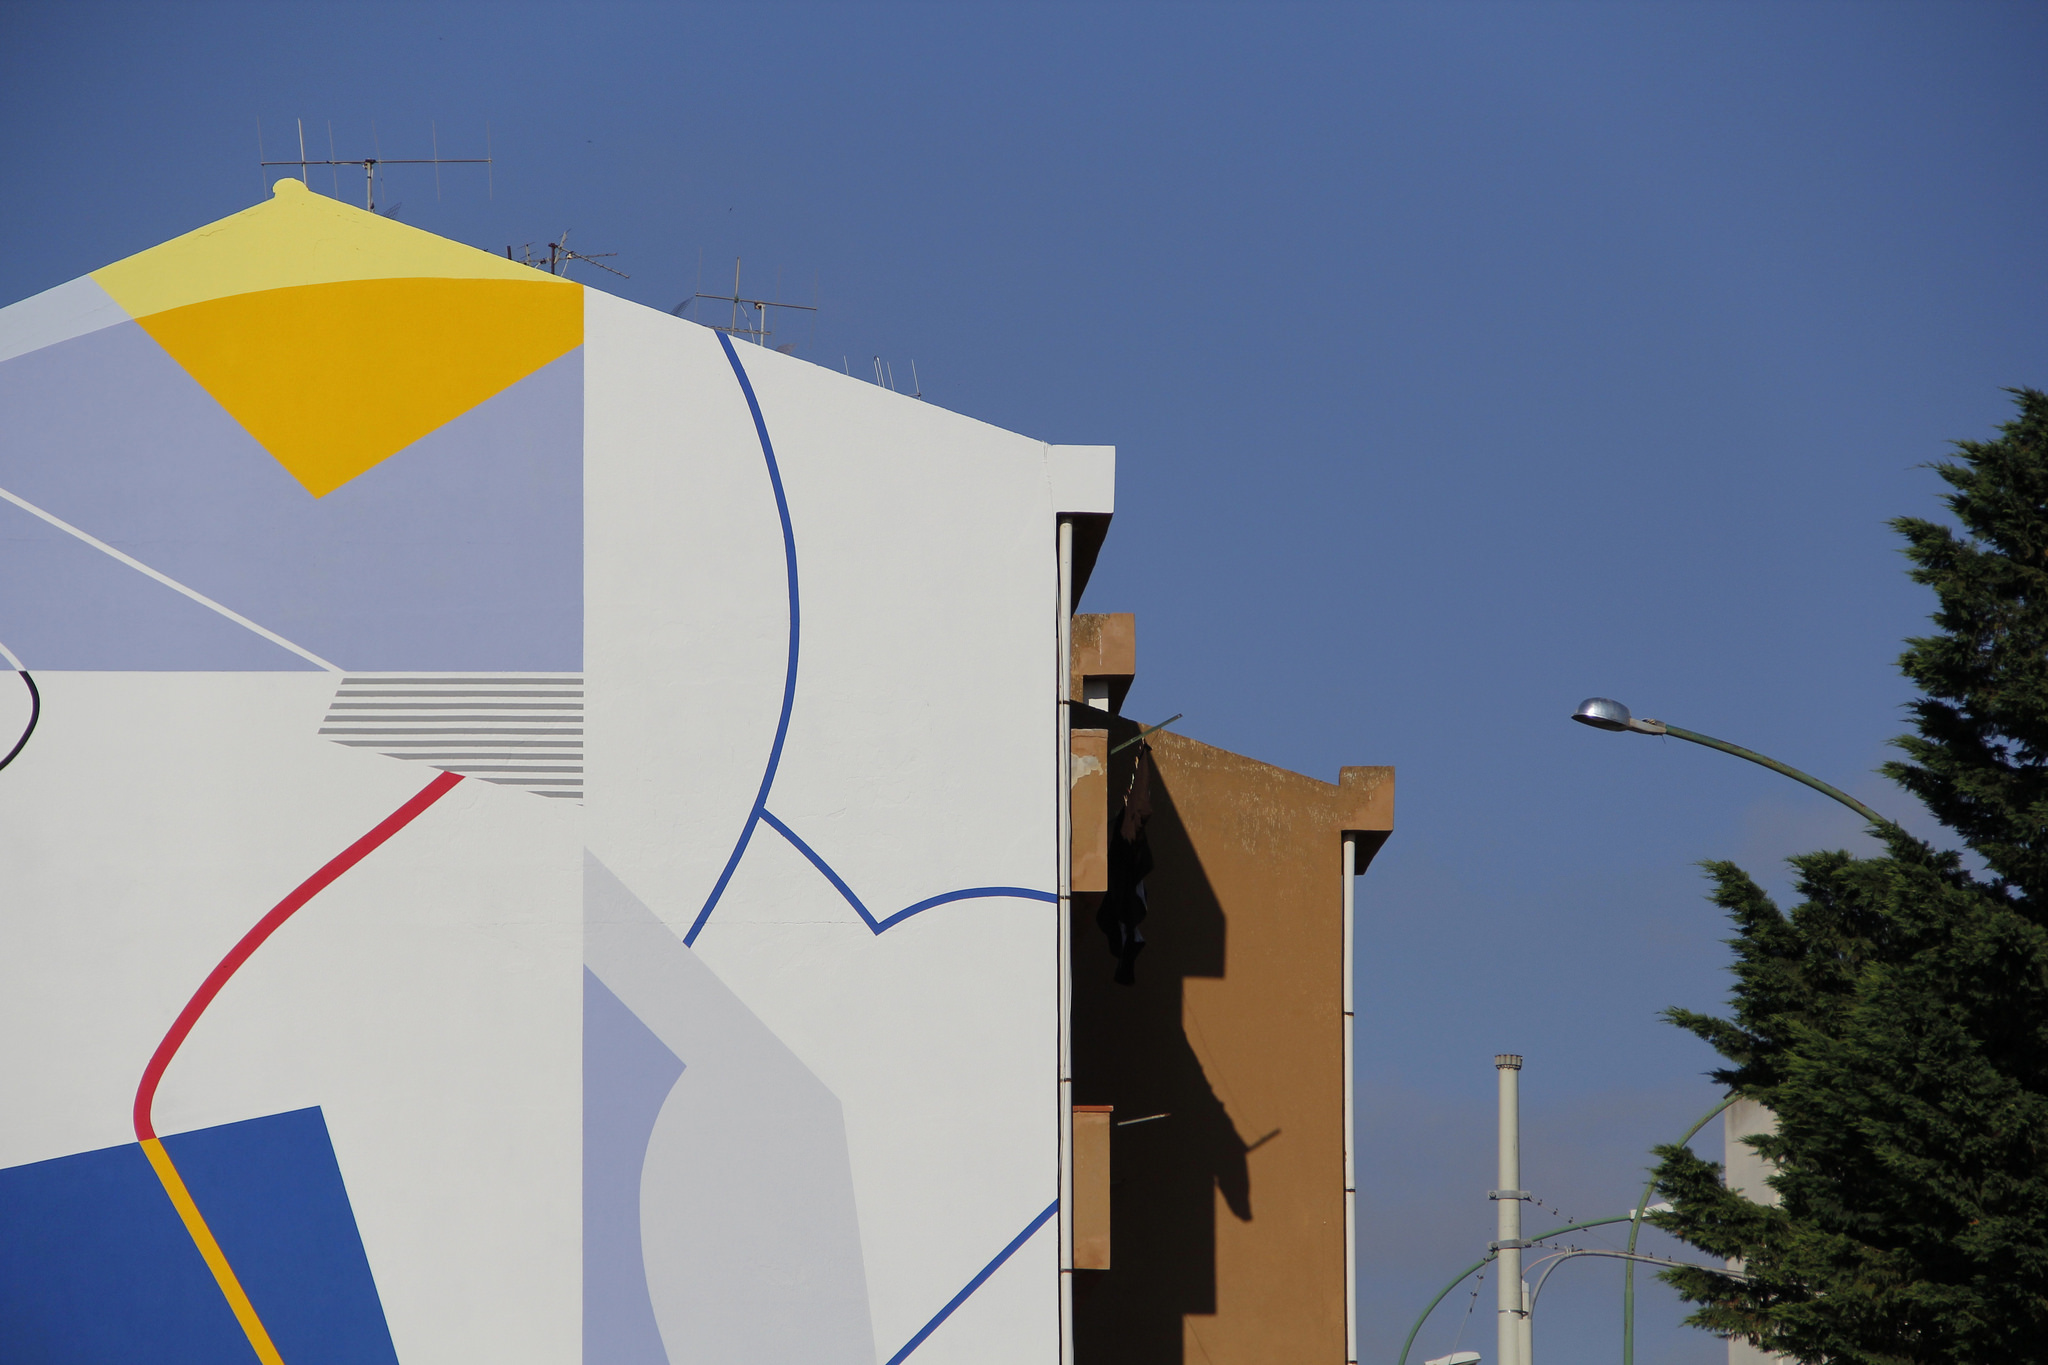 GUE murale Alcamo Sicilia Street Art